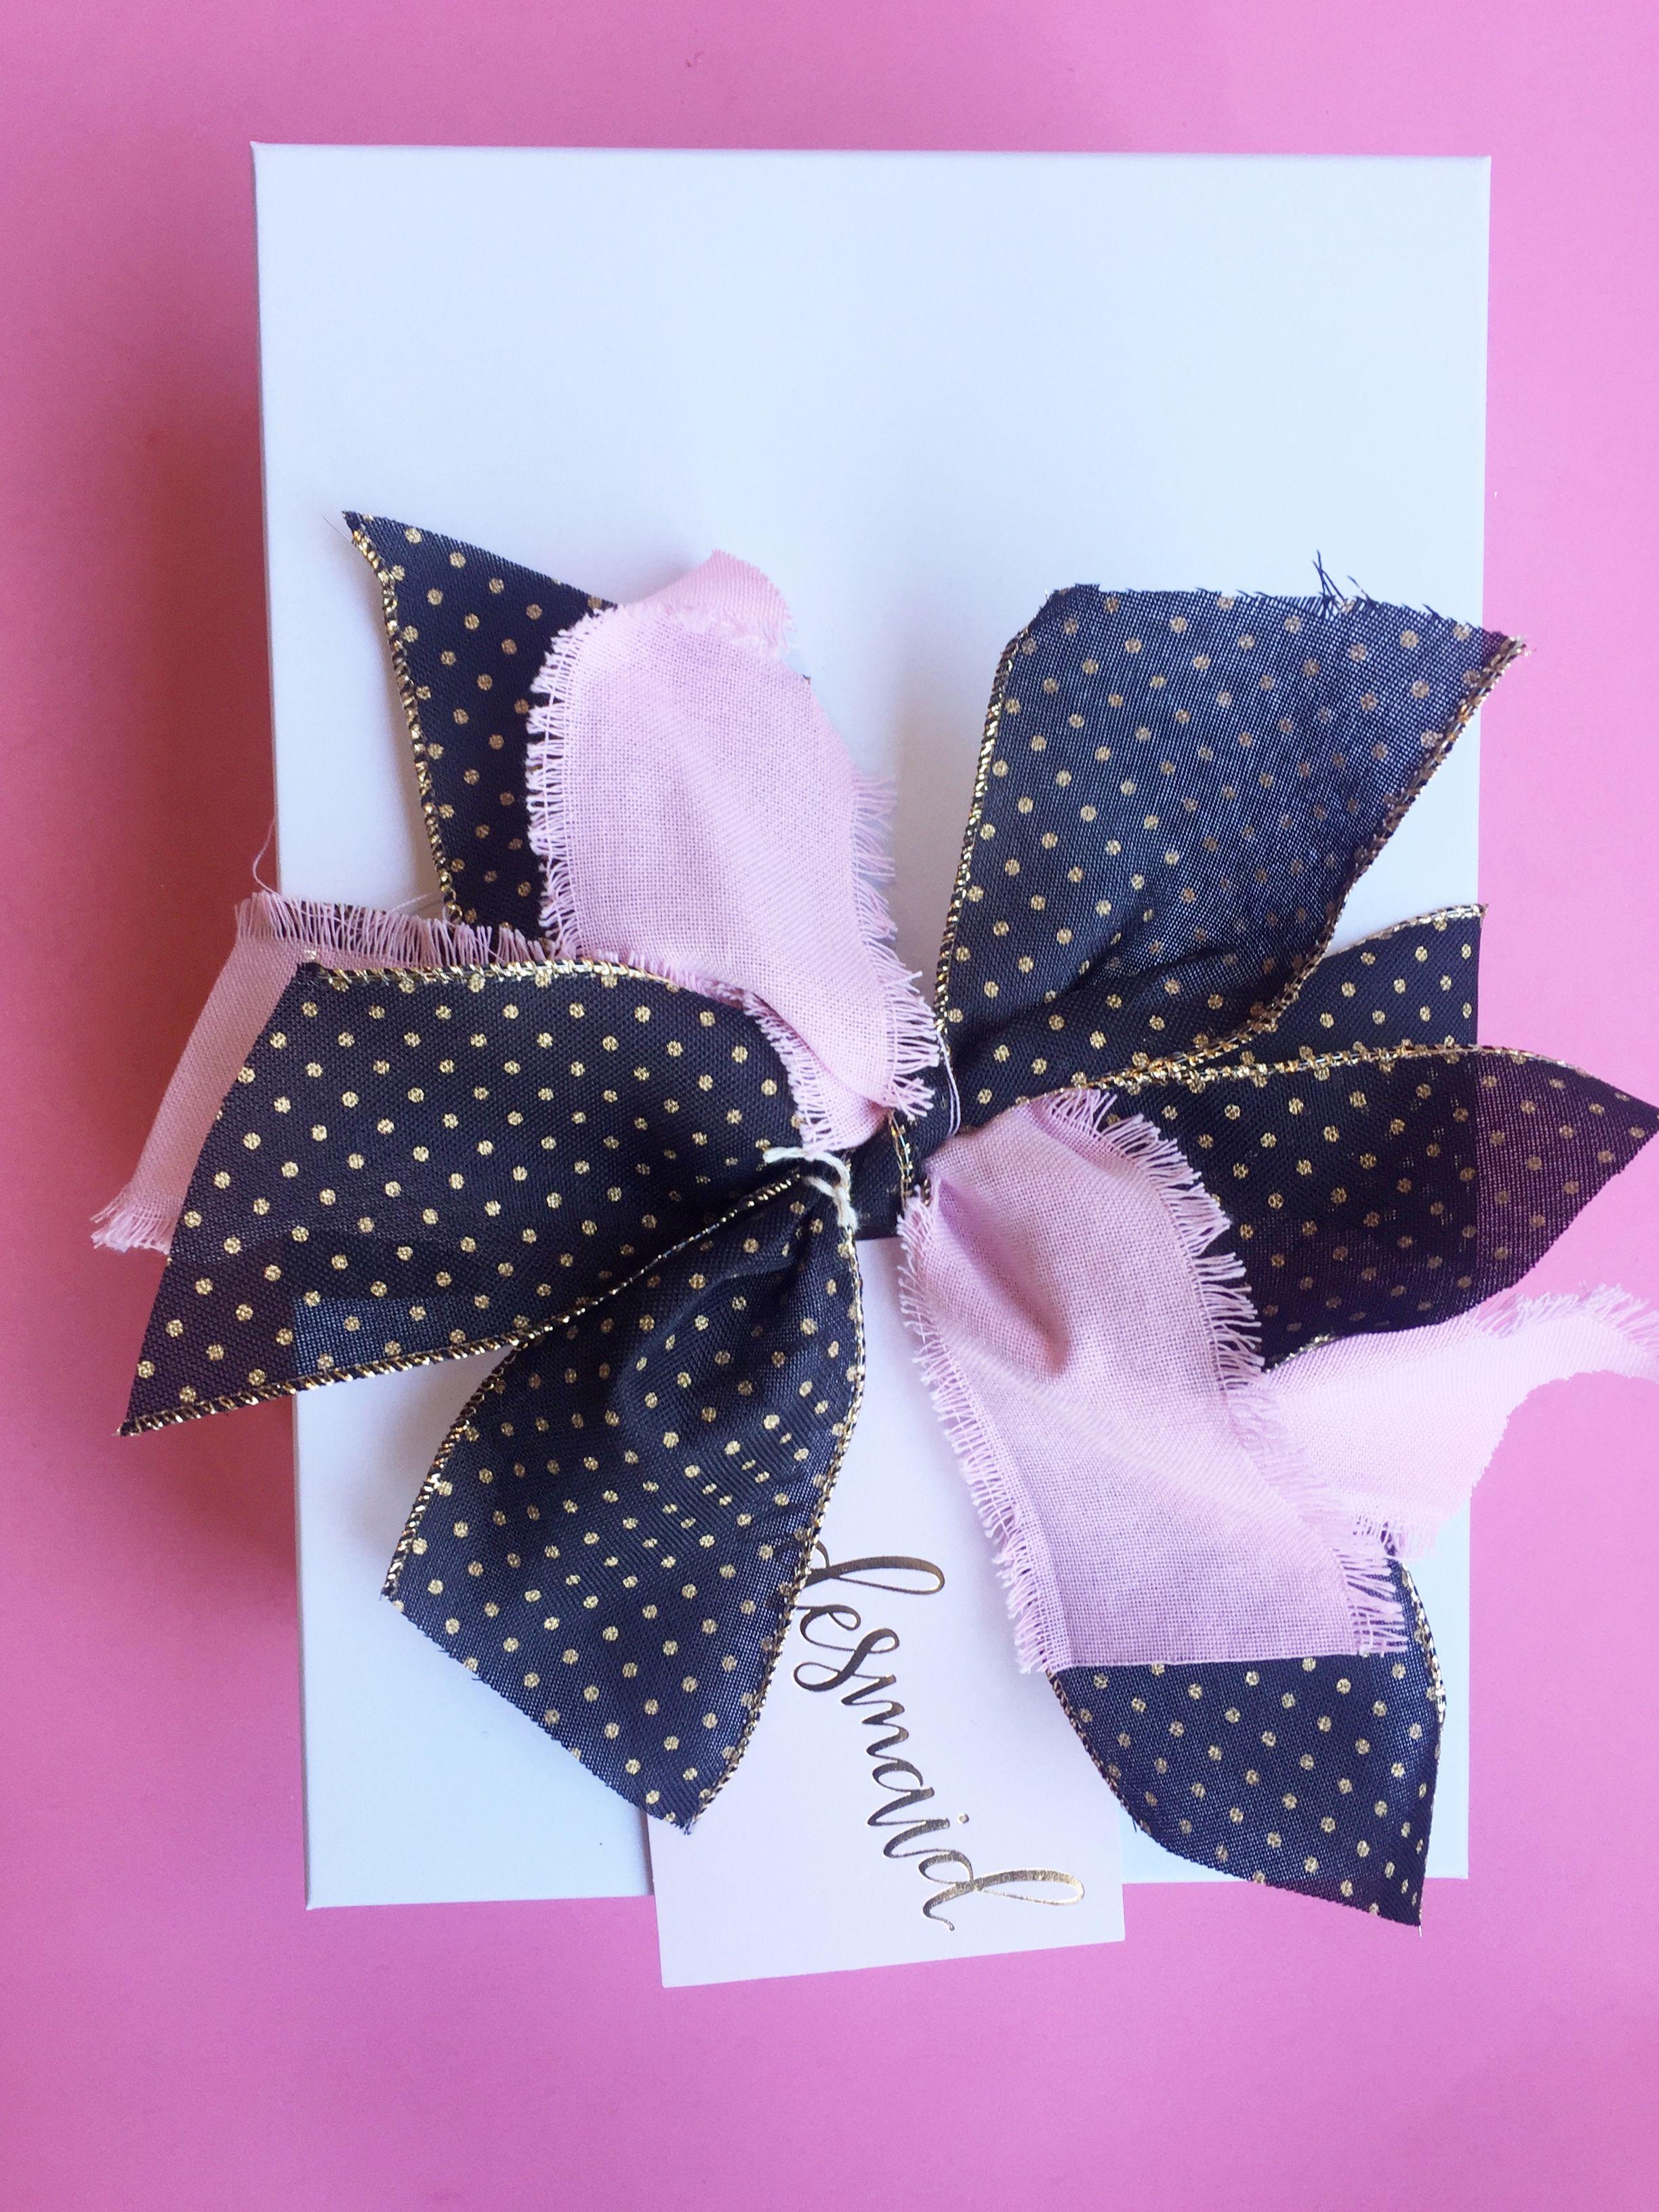 The Most Fabulous Bridesmaid Proposal Gifts Bridesmaid